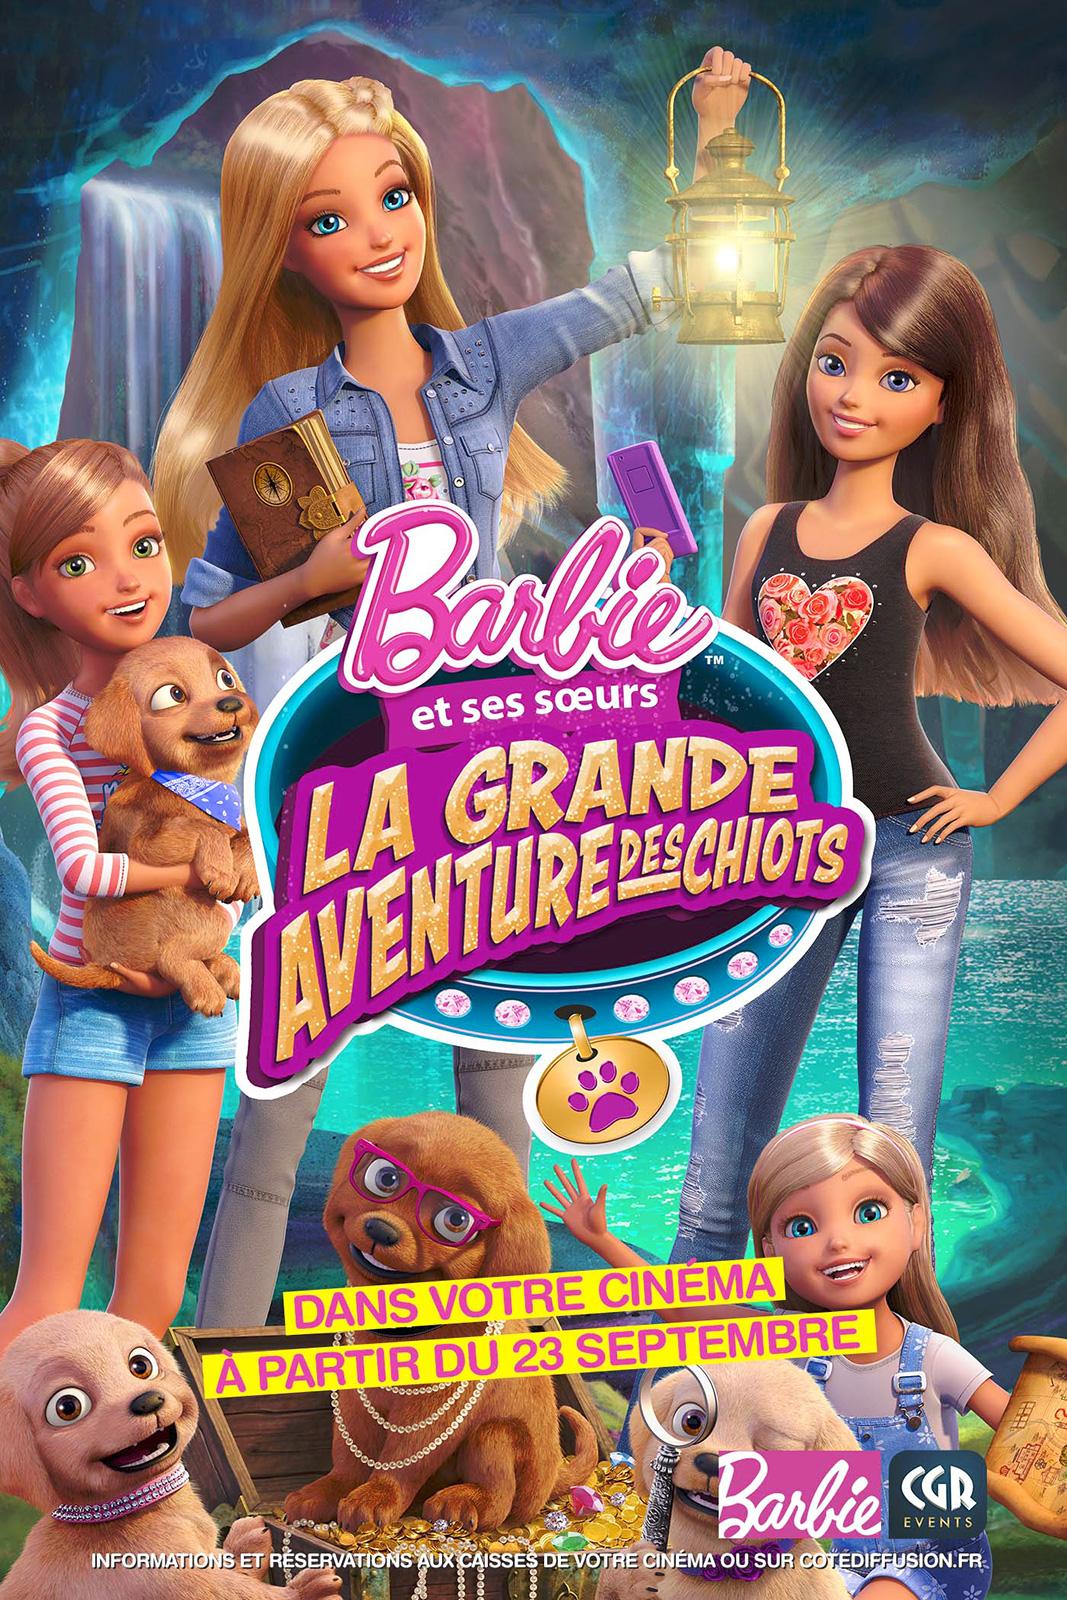 Barbie - La grande aventure des chiots (CGR Events)